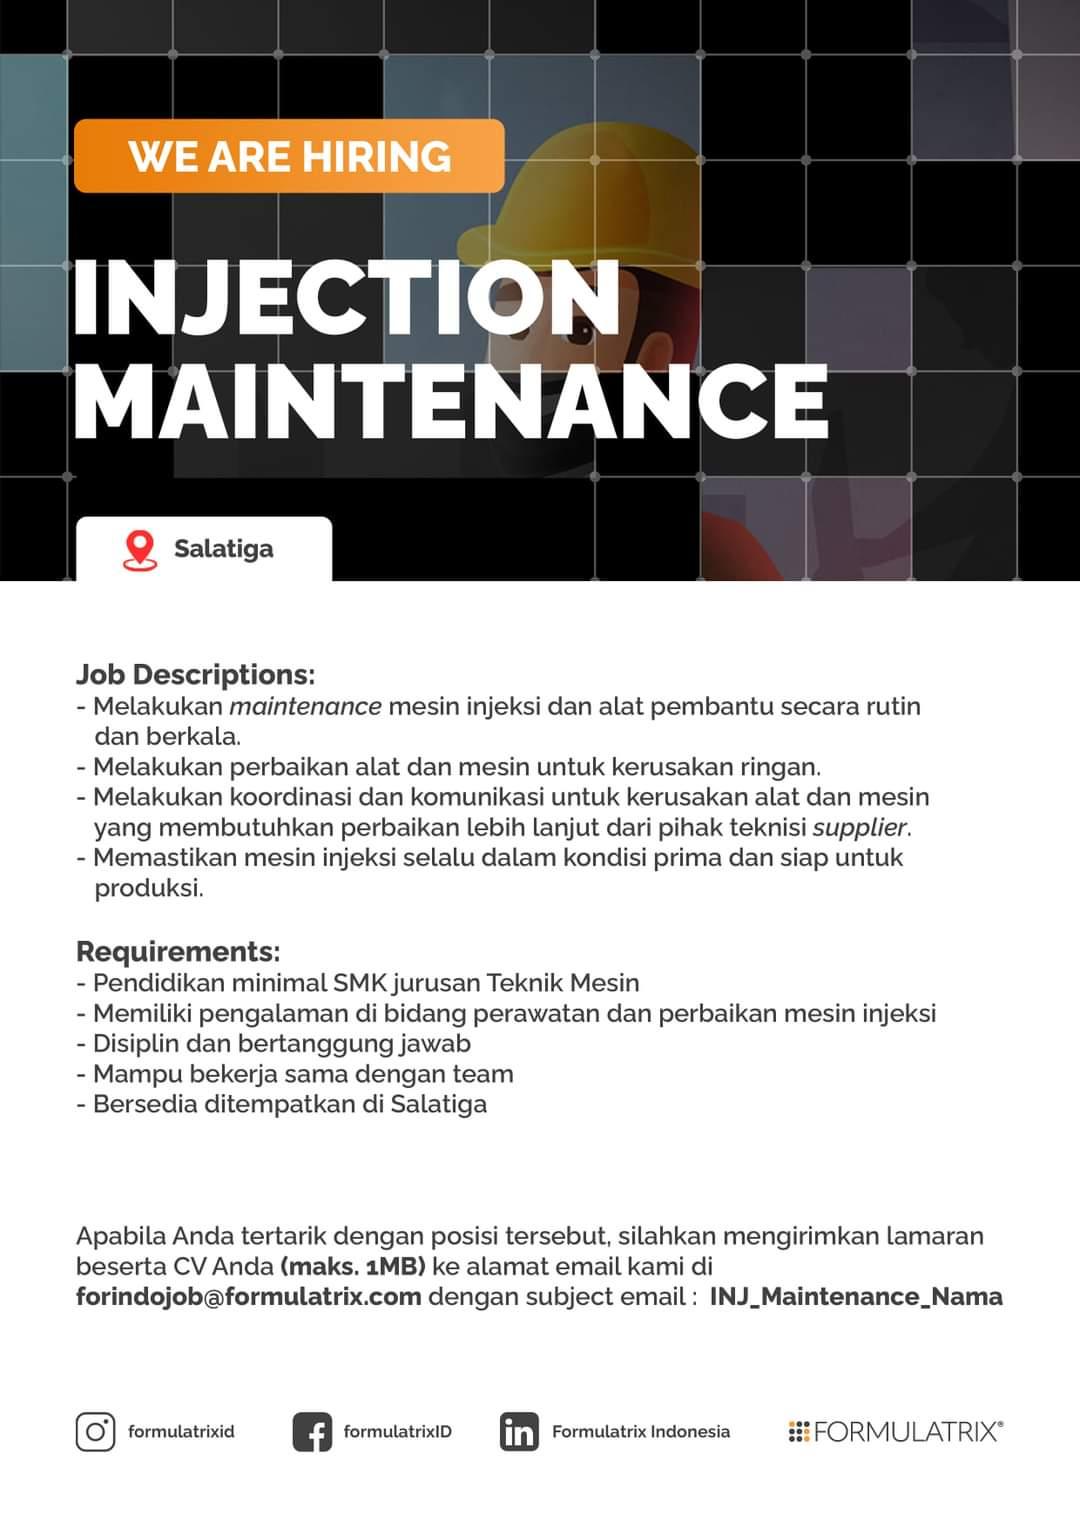 Lowongan Salatiga & Semarang Formulatrix Indonesia Untuk Posisi Toolpather & Injection Maintenance